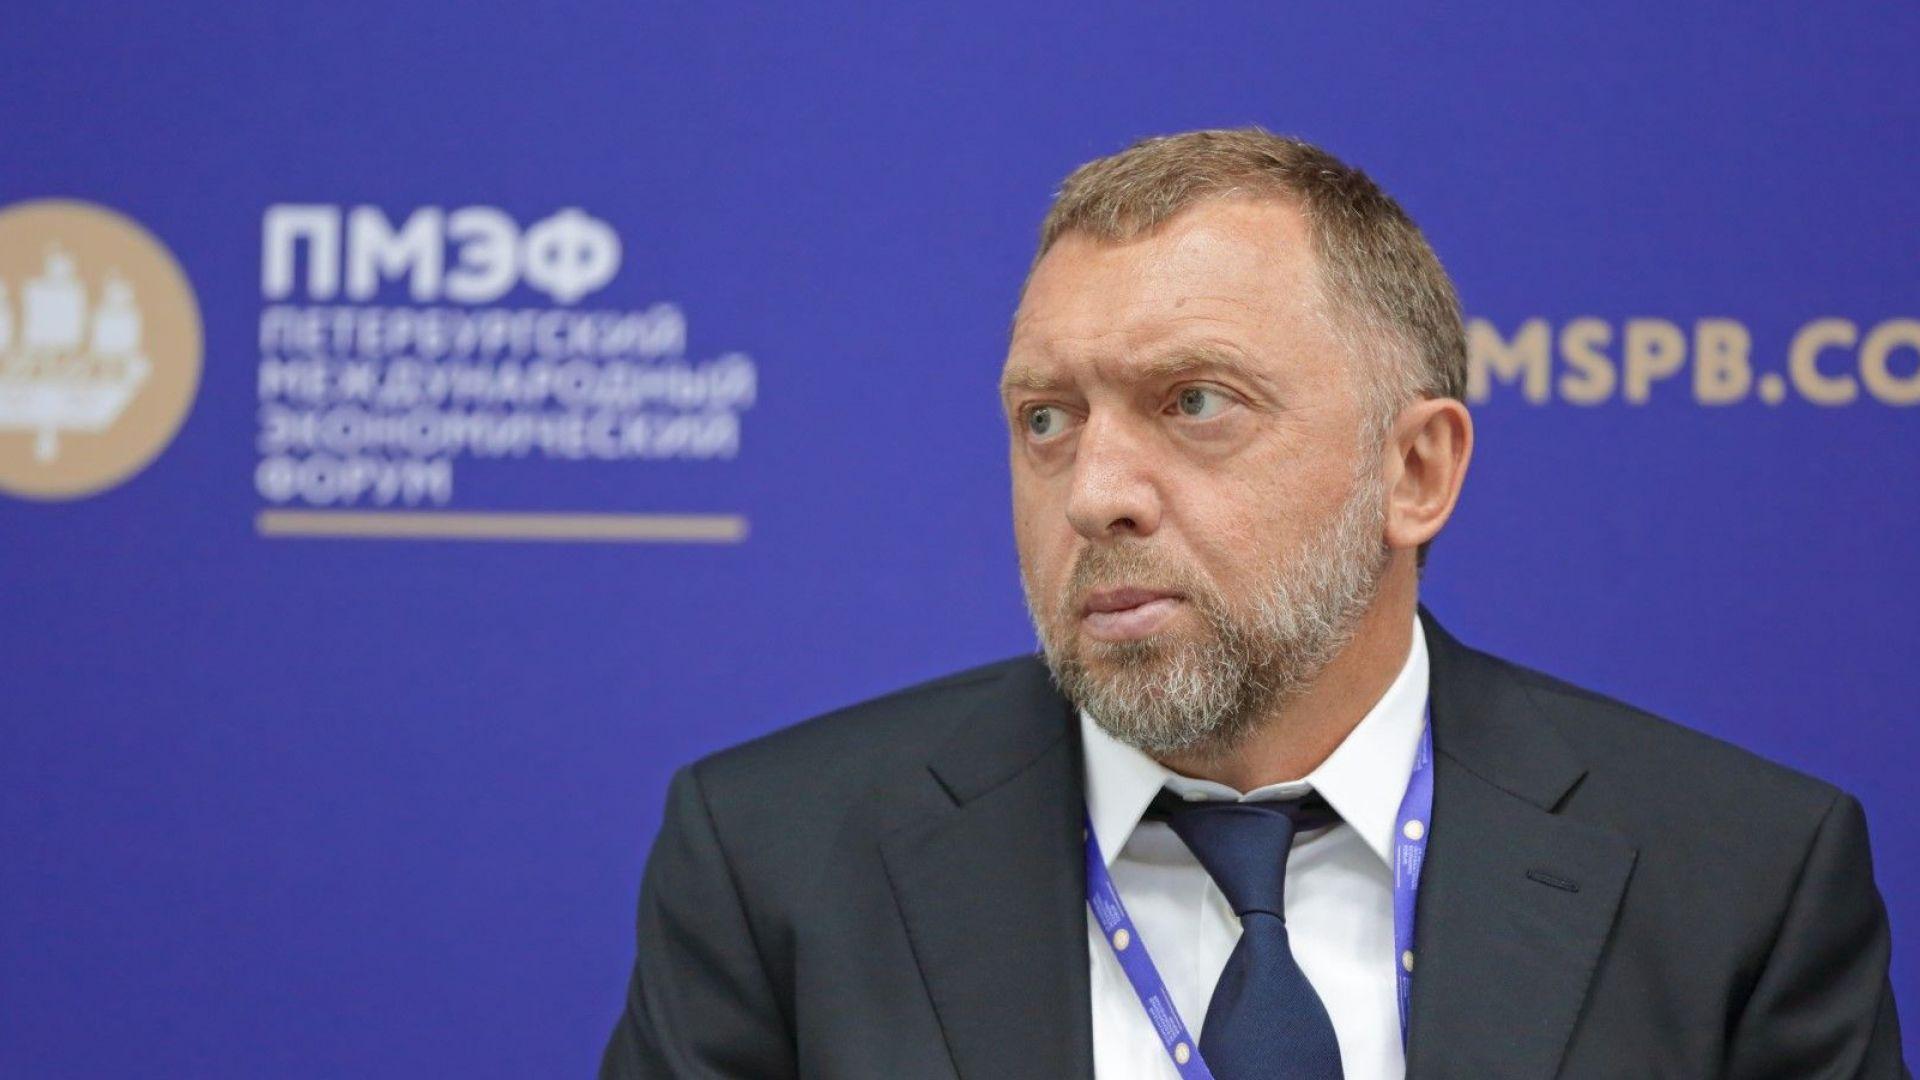 САЩ замразили активи на Олег Дерипаска